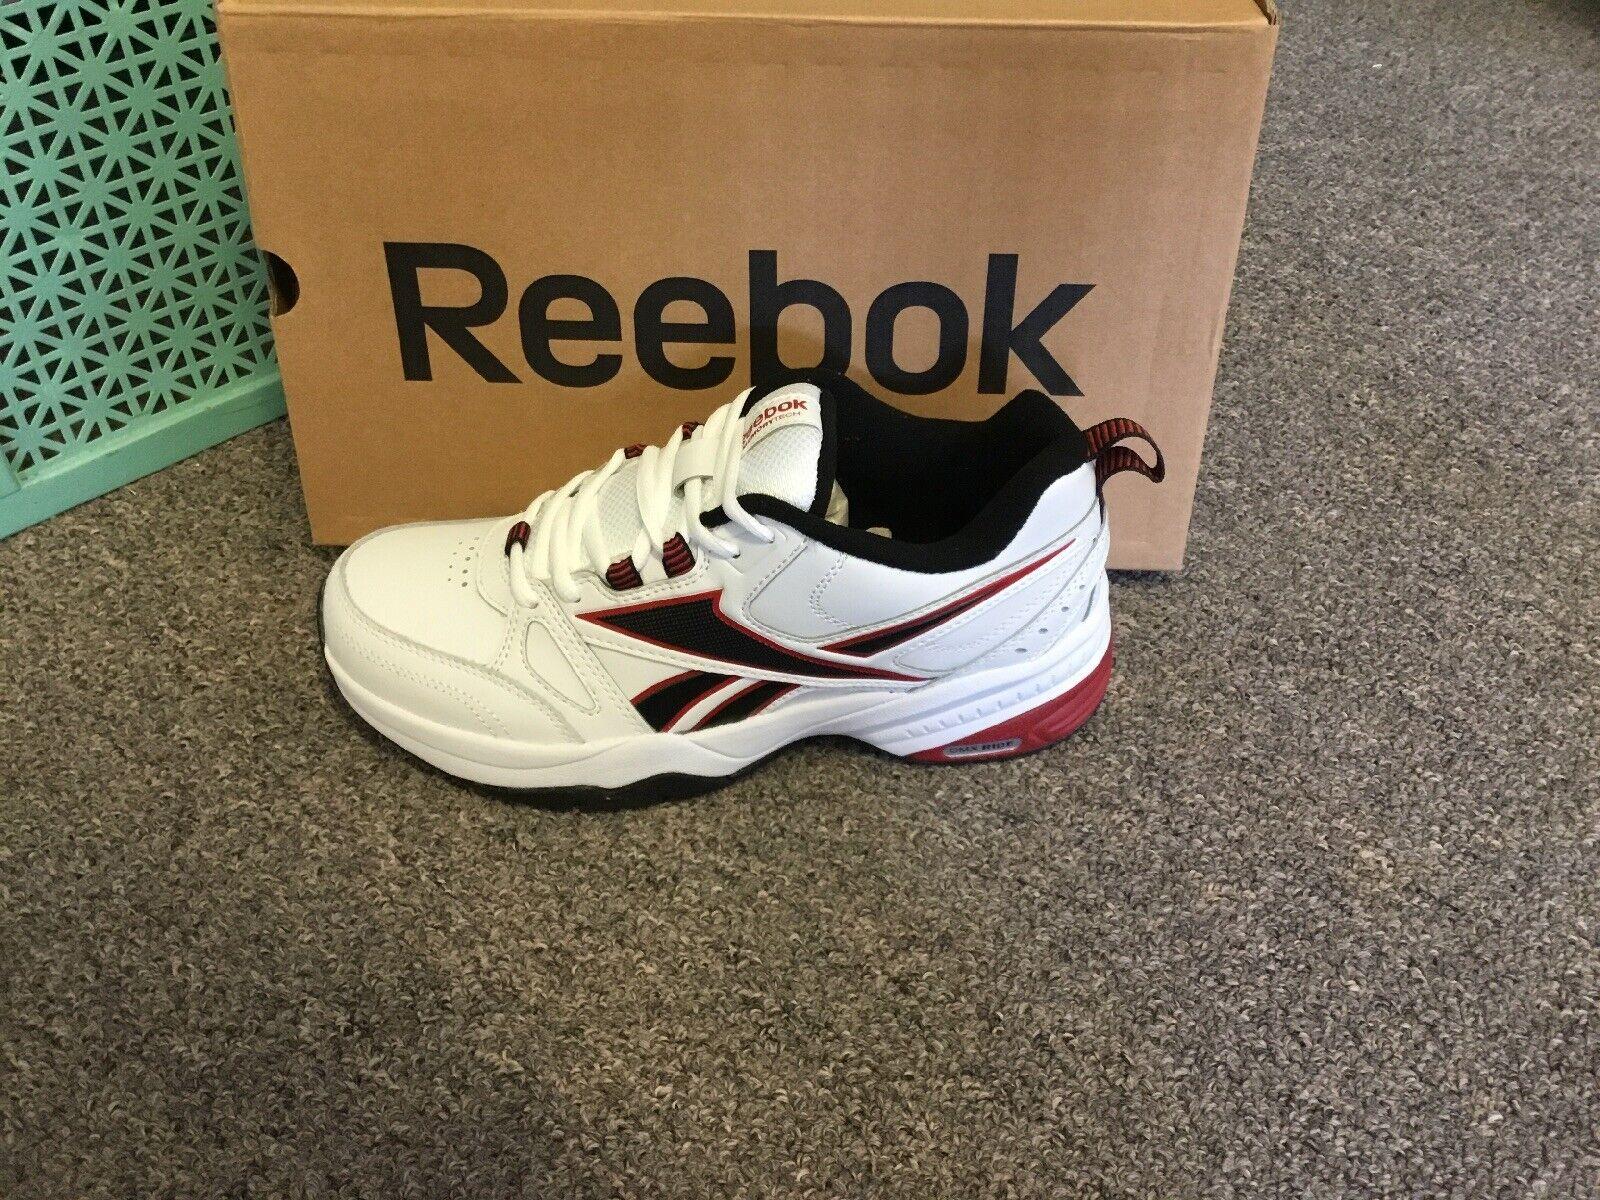 New Men's Reebok Royal Trainer Mt Size 8 Medium